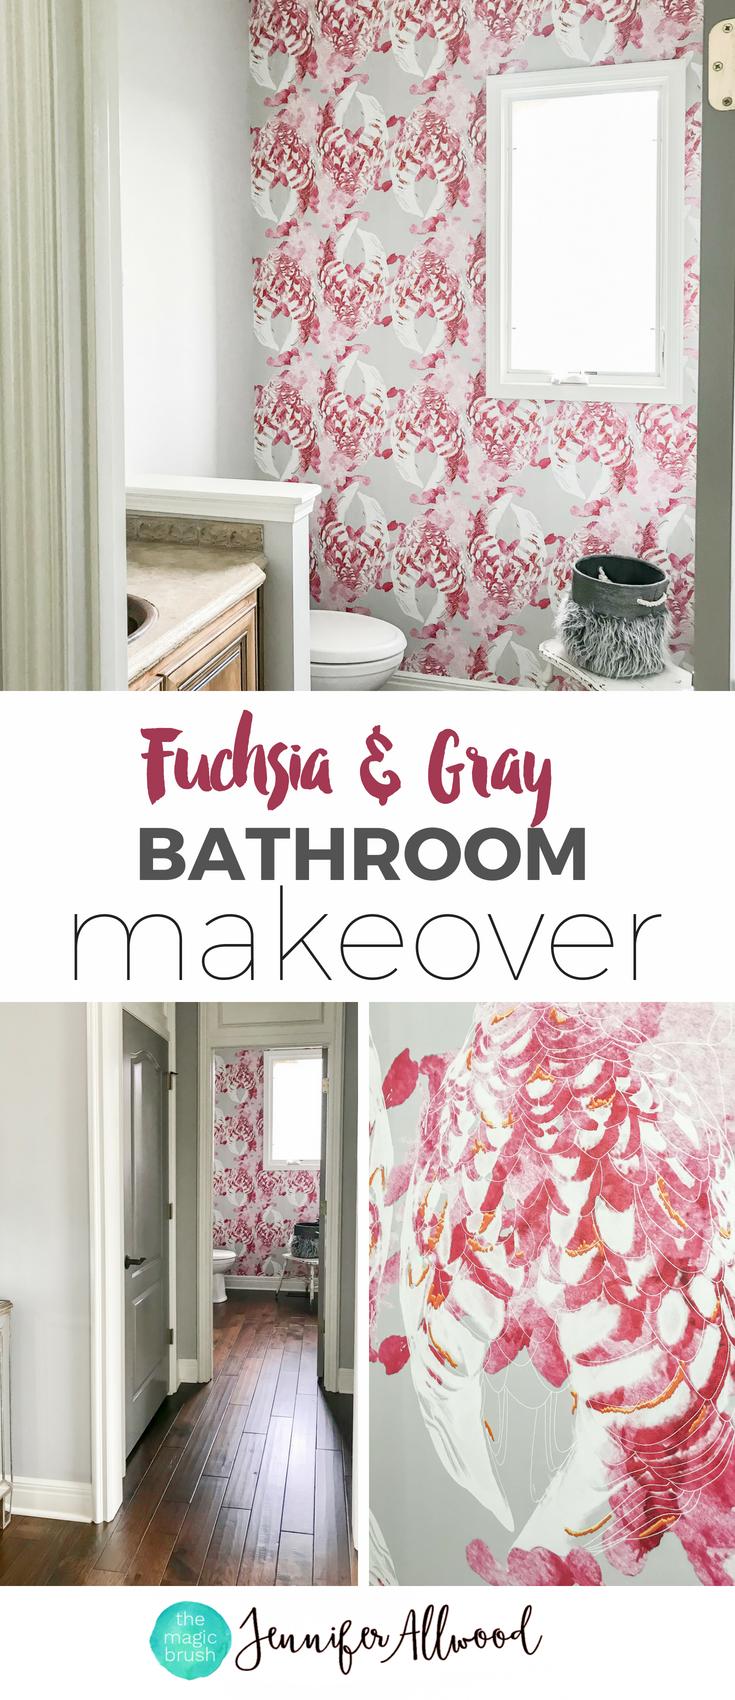 Tree Design Wallpaper Living Room: Fuchsia And Gray Bathroom Wallpaper Ideas By Jennifer